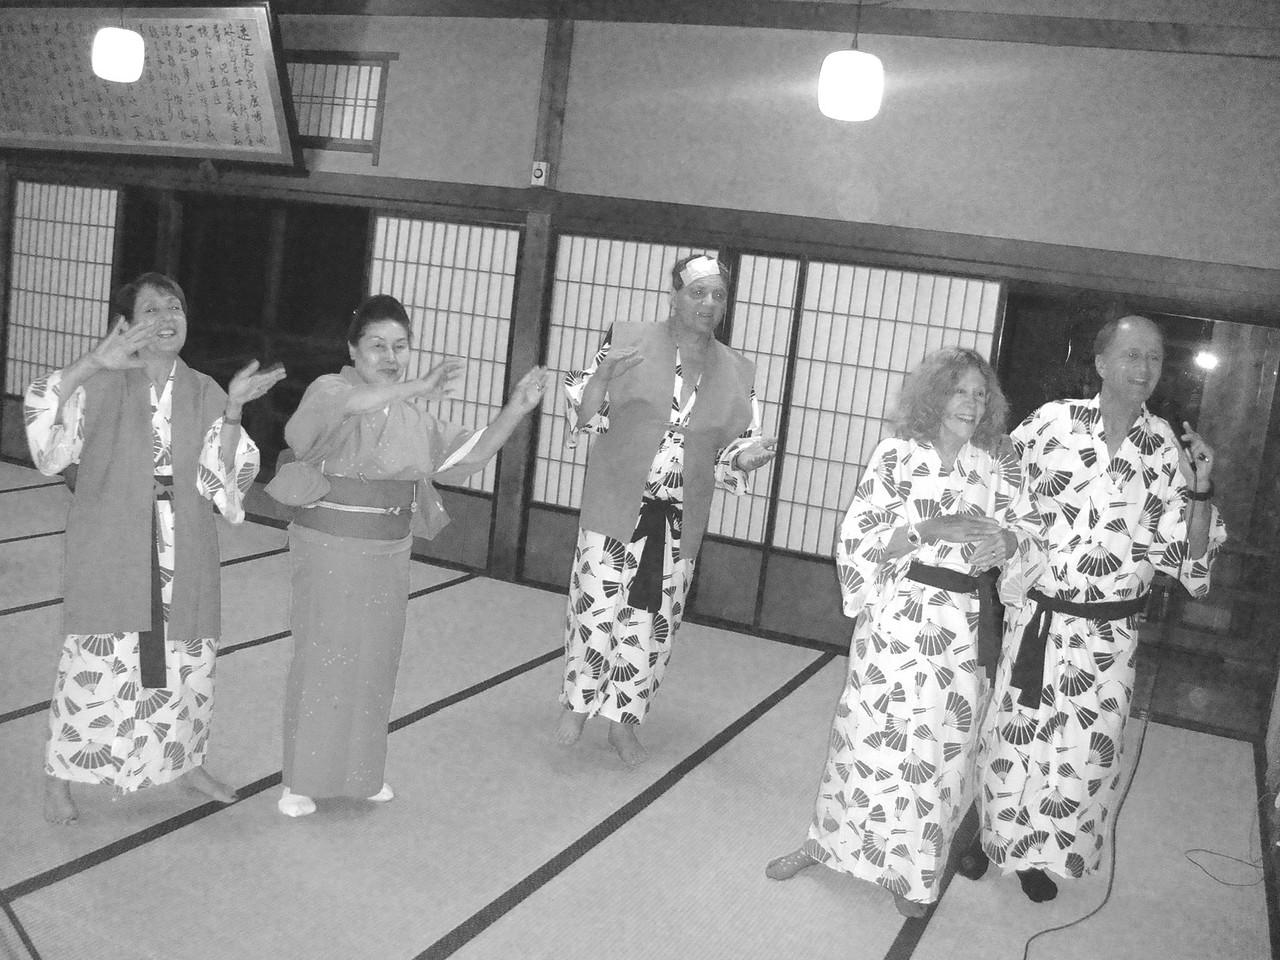 DANCING TO KARAOKE AT OUR INN